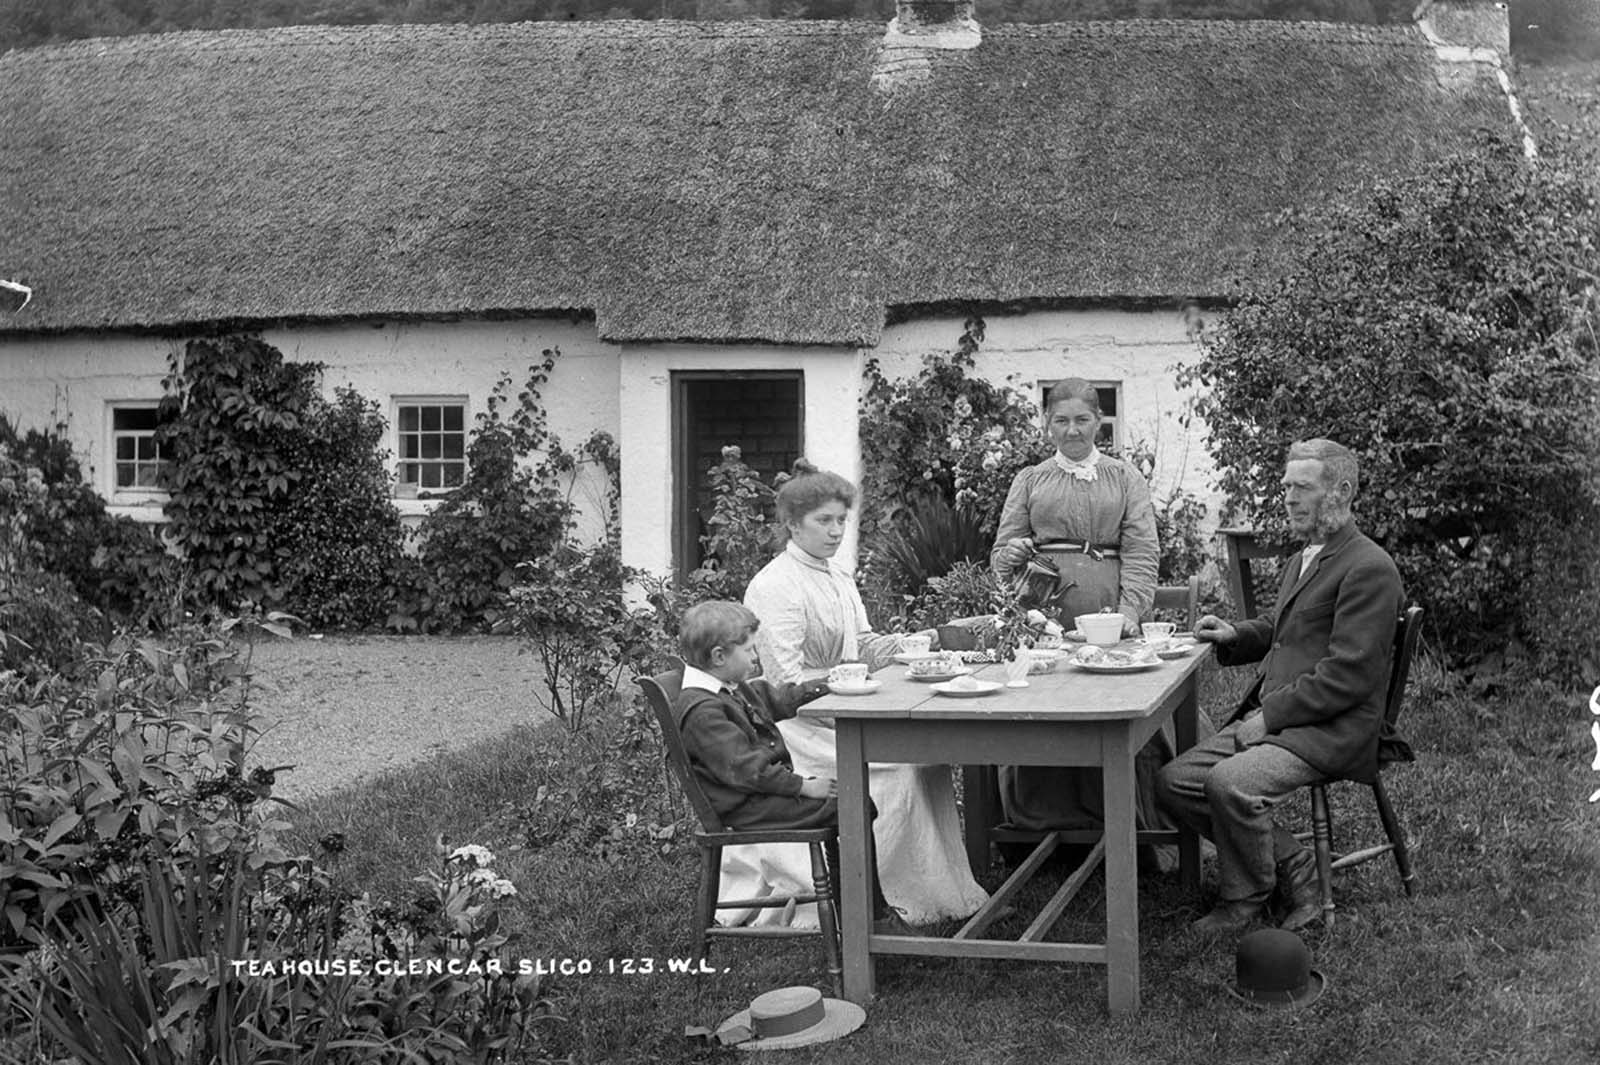 The Glencar Tea House in County Leitrim. 1900.